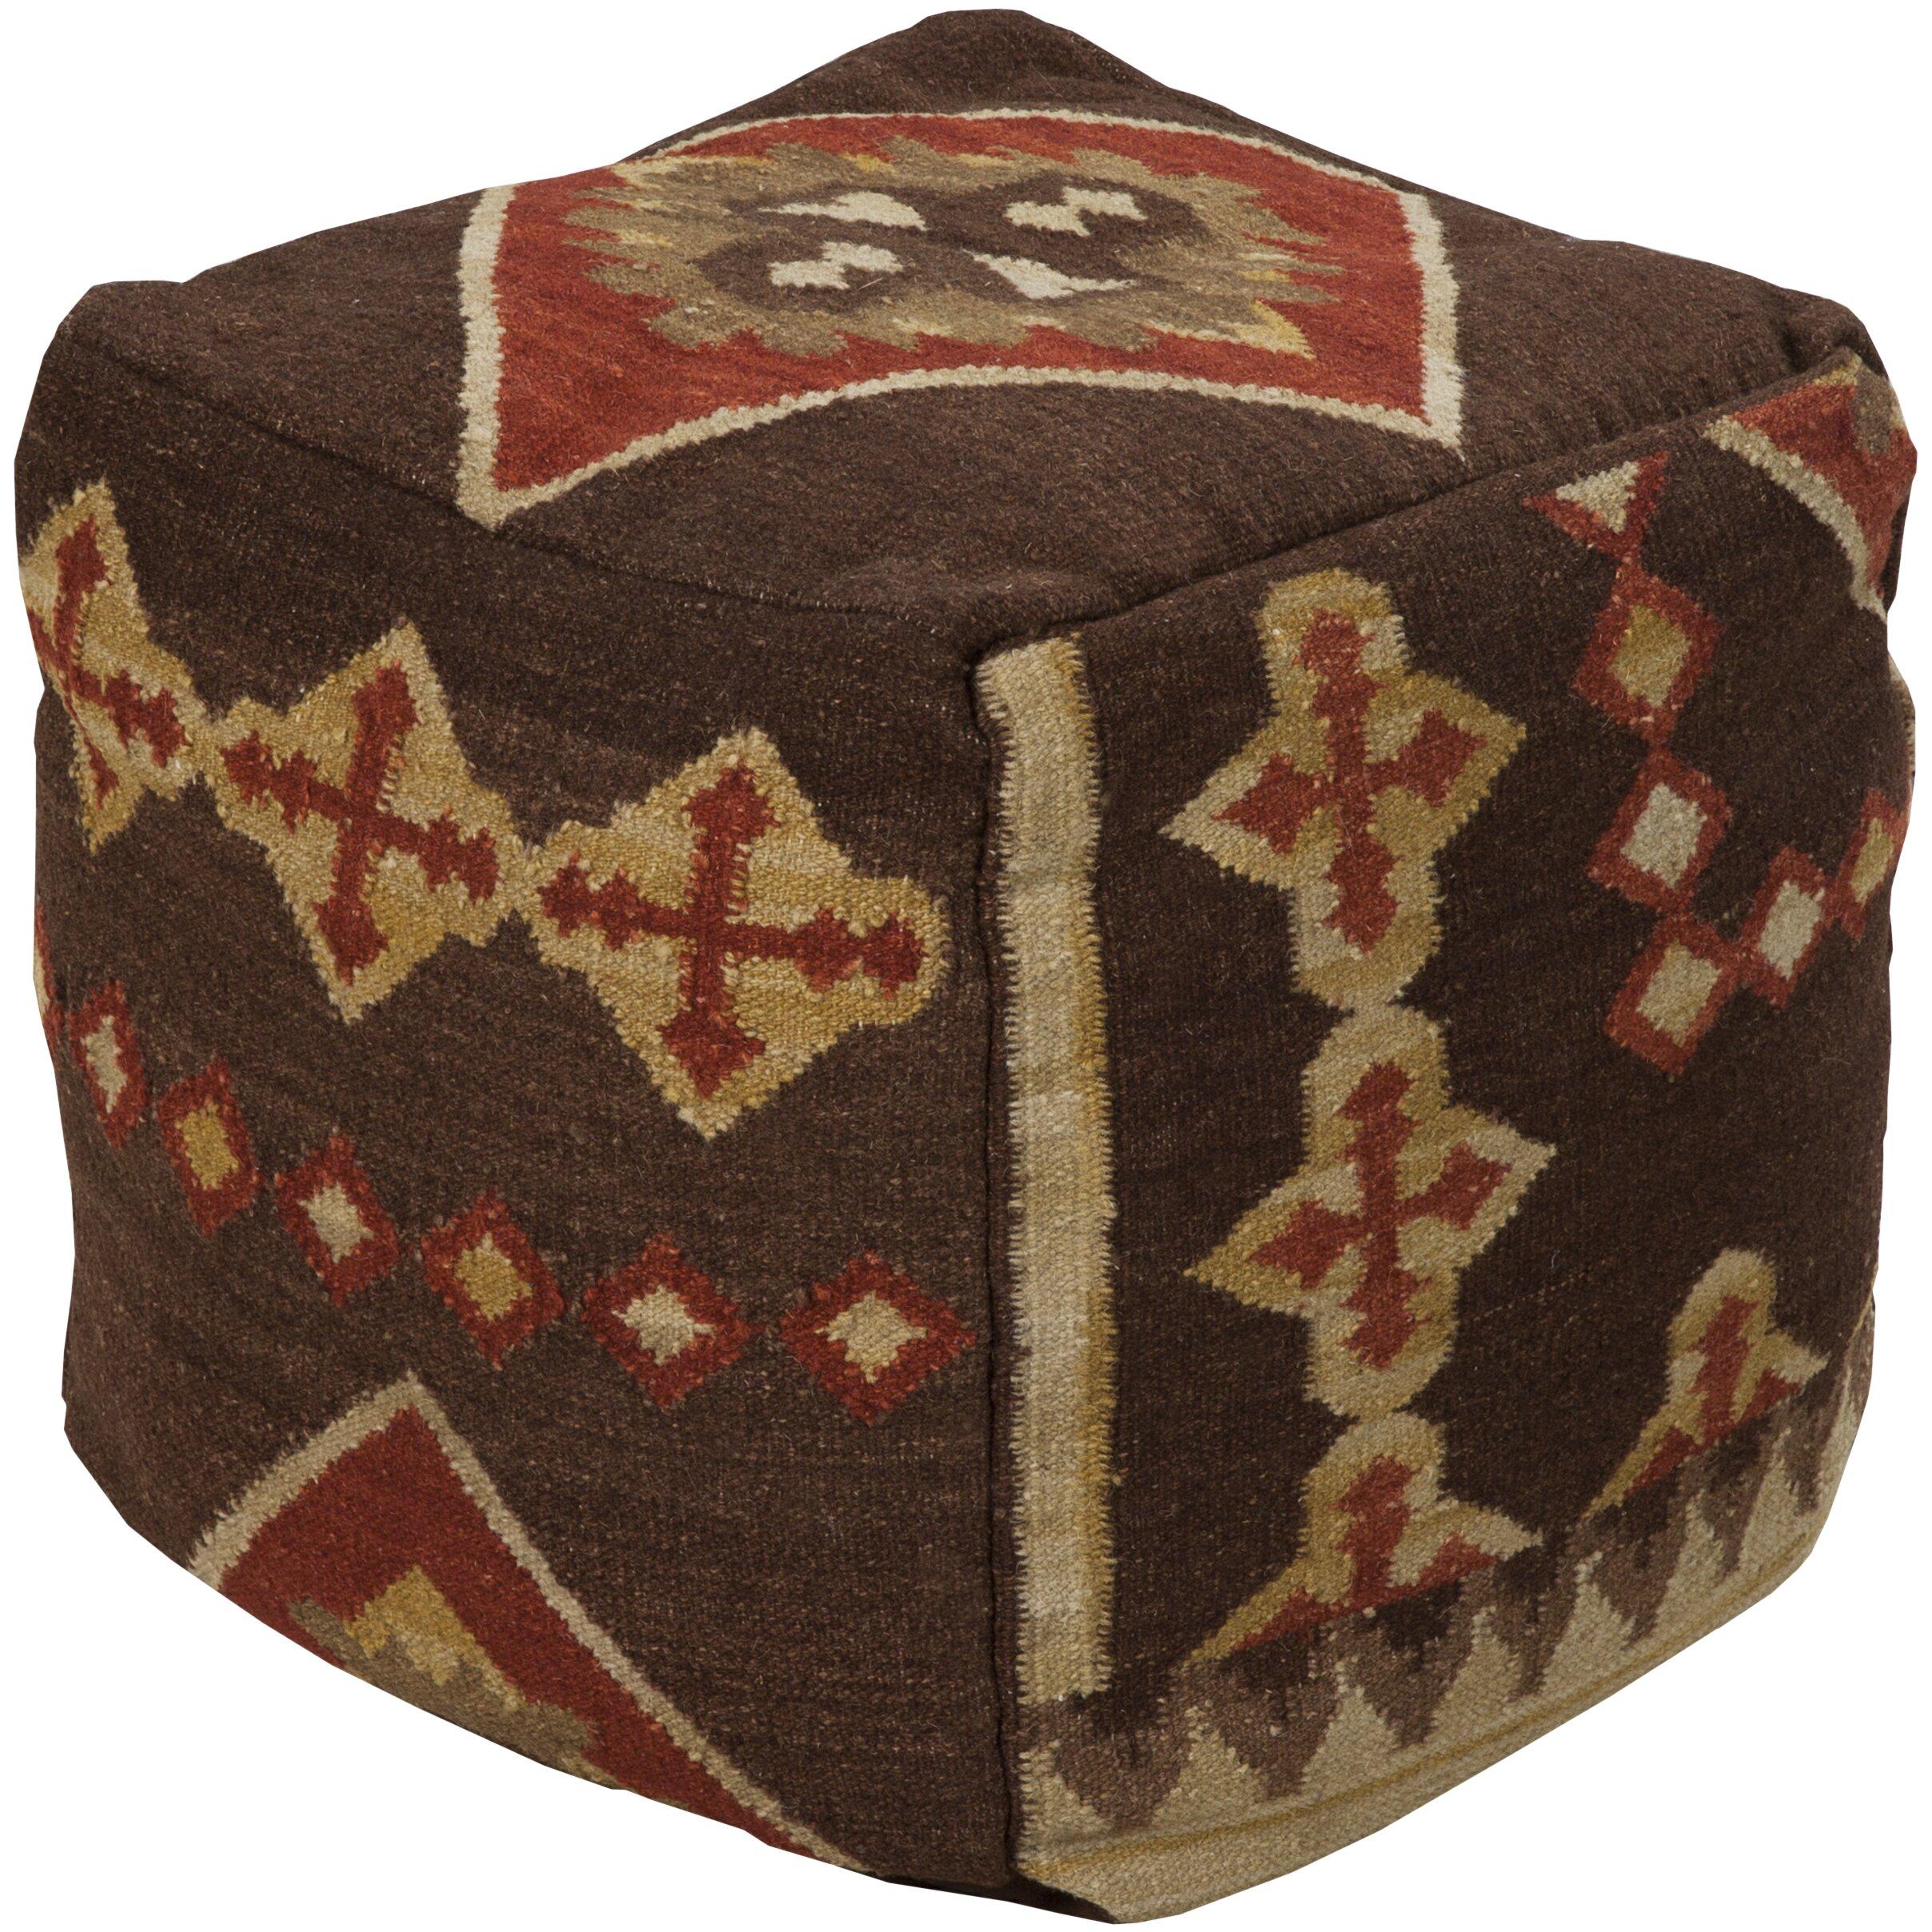 surya pouf cube ottoman reviews wayfair. Black Bedroom Furniture Sets. Home Design Ideas